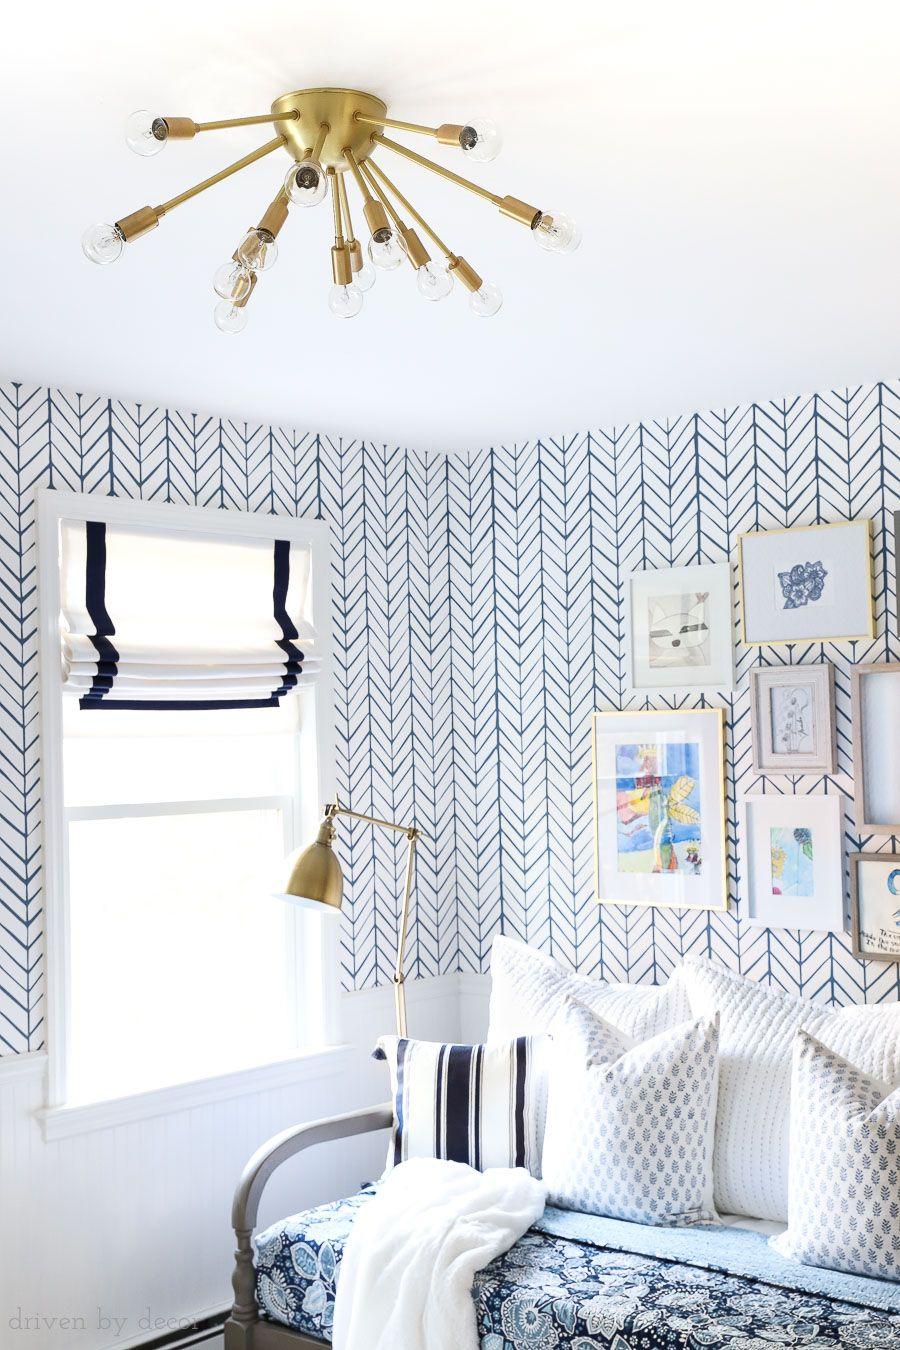 My Five Lighting Favorites! Bedroom ceiling light